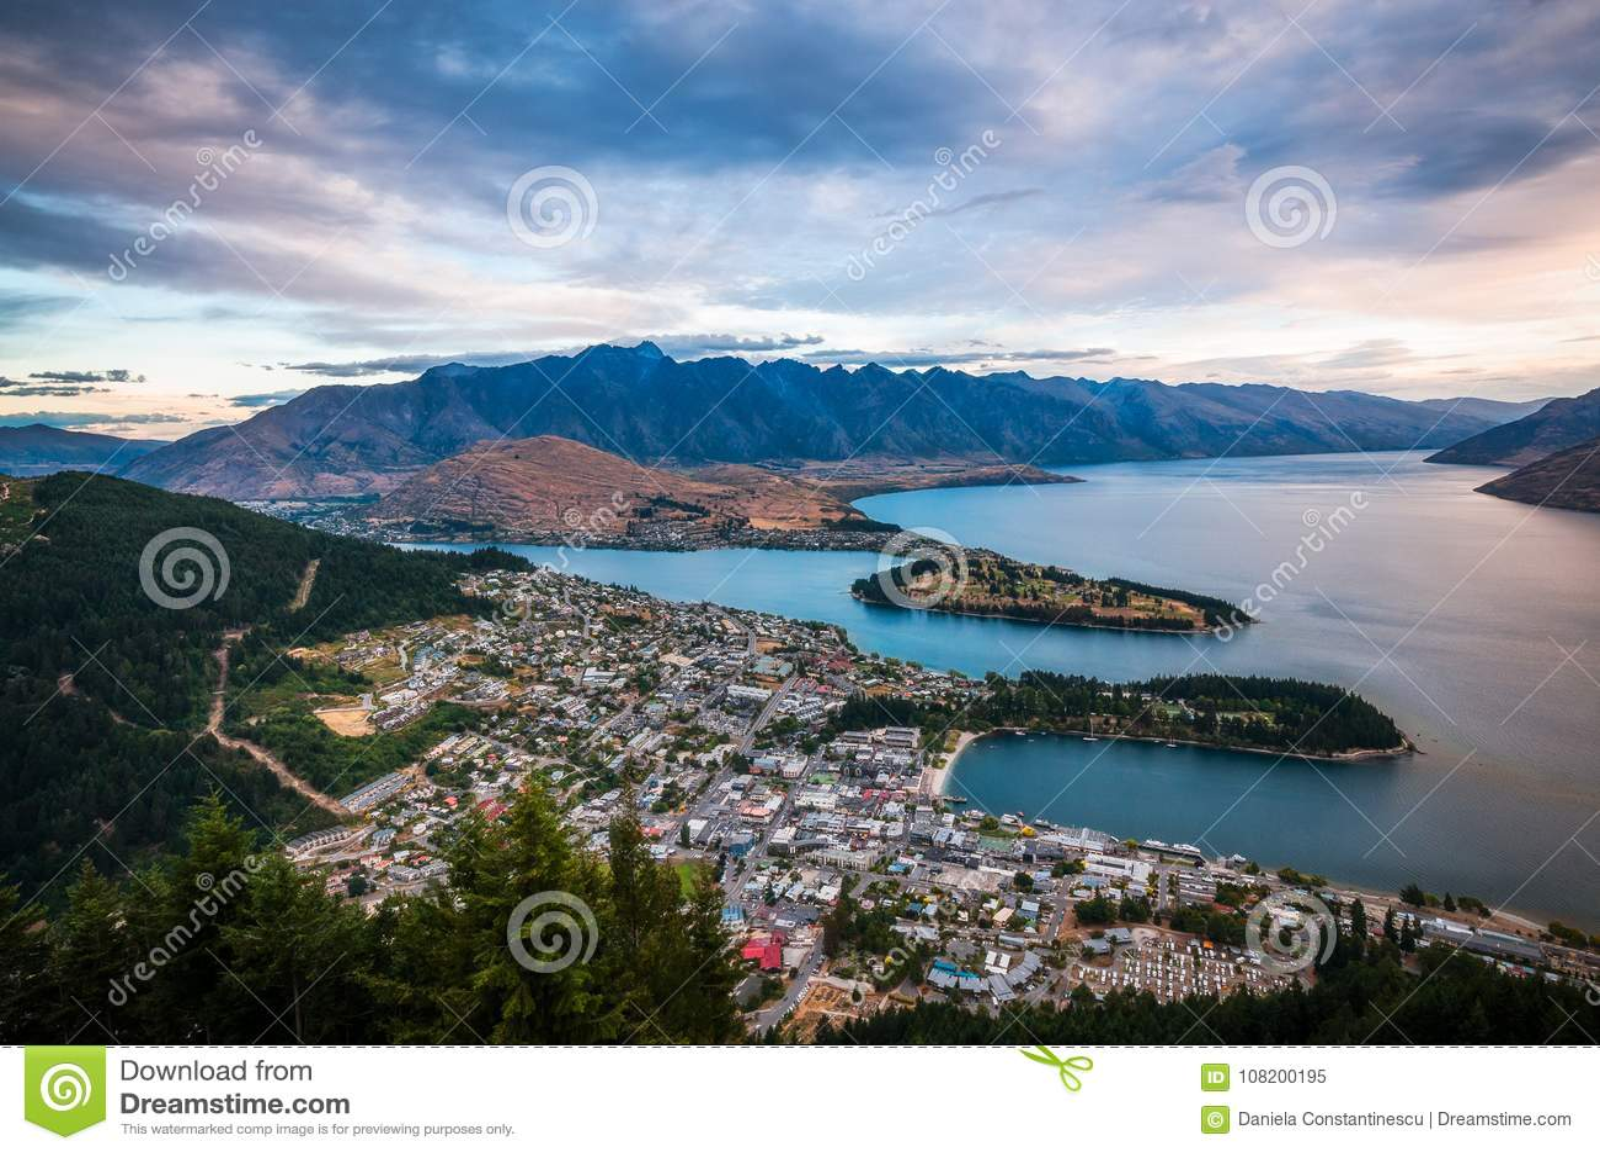 Queenstown Sunset View, New Zealand